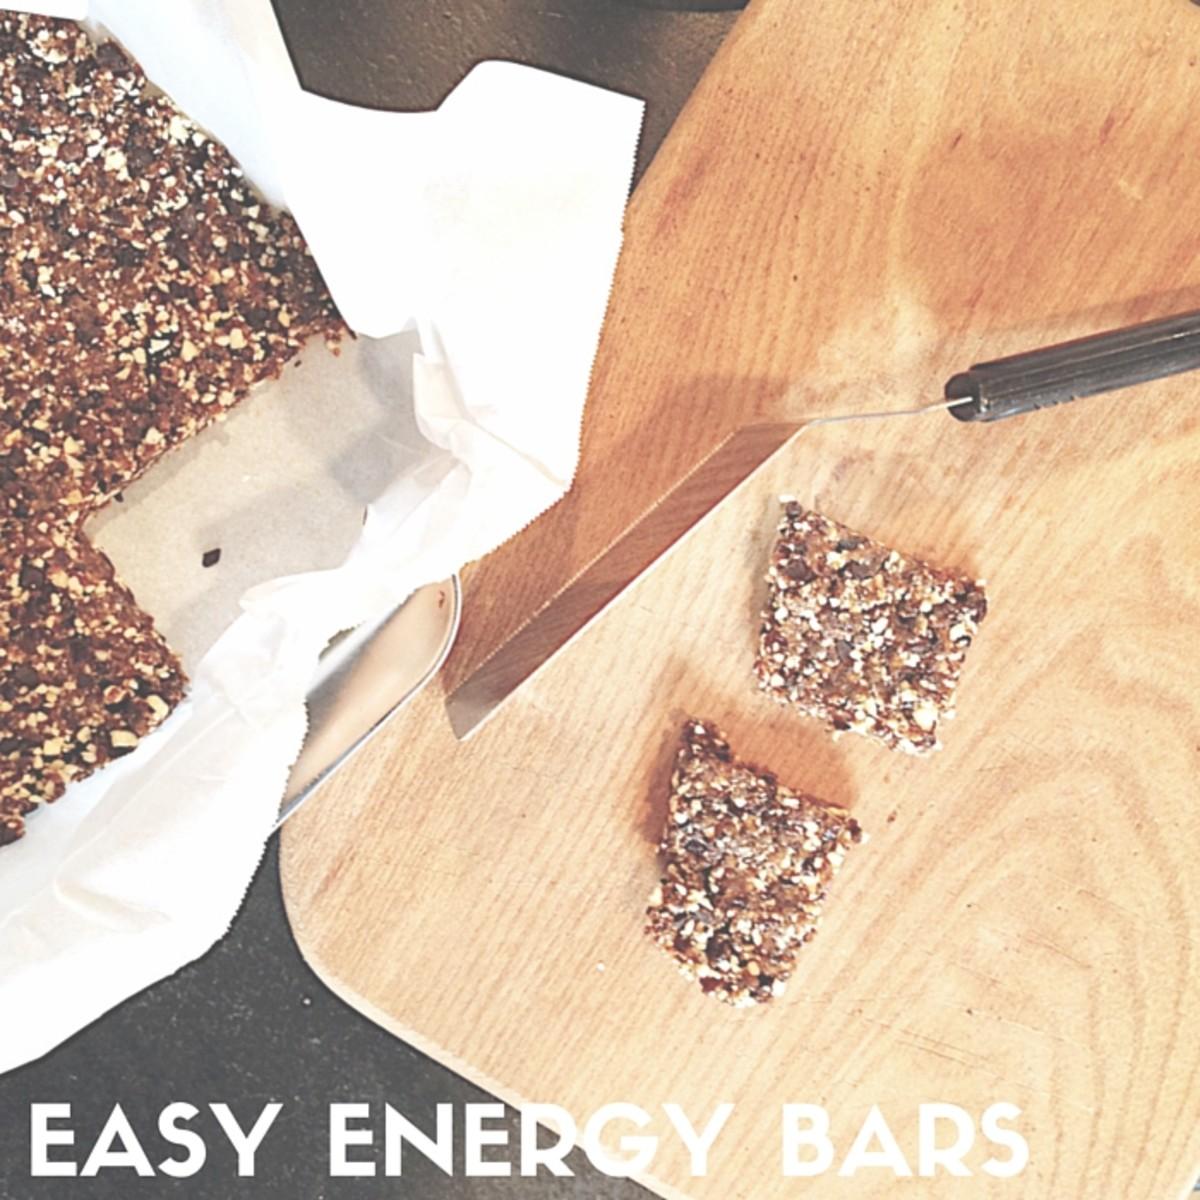 EASY ENERGY BARS